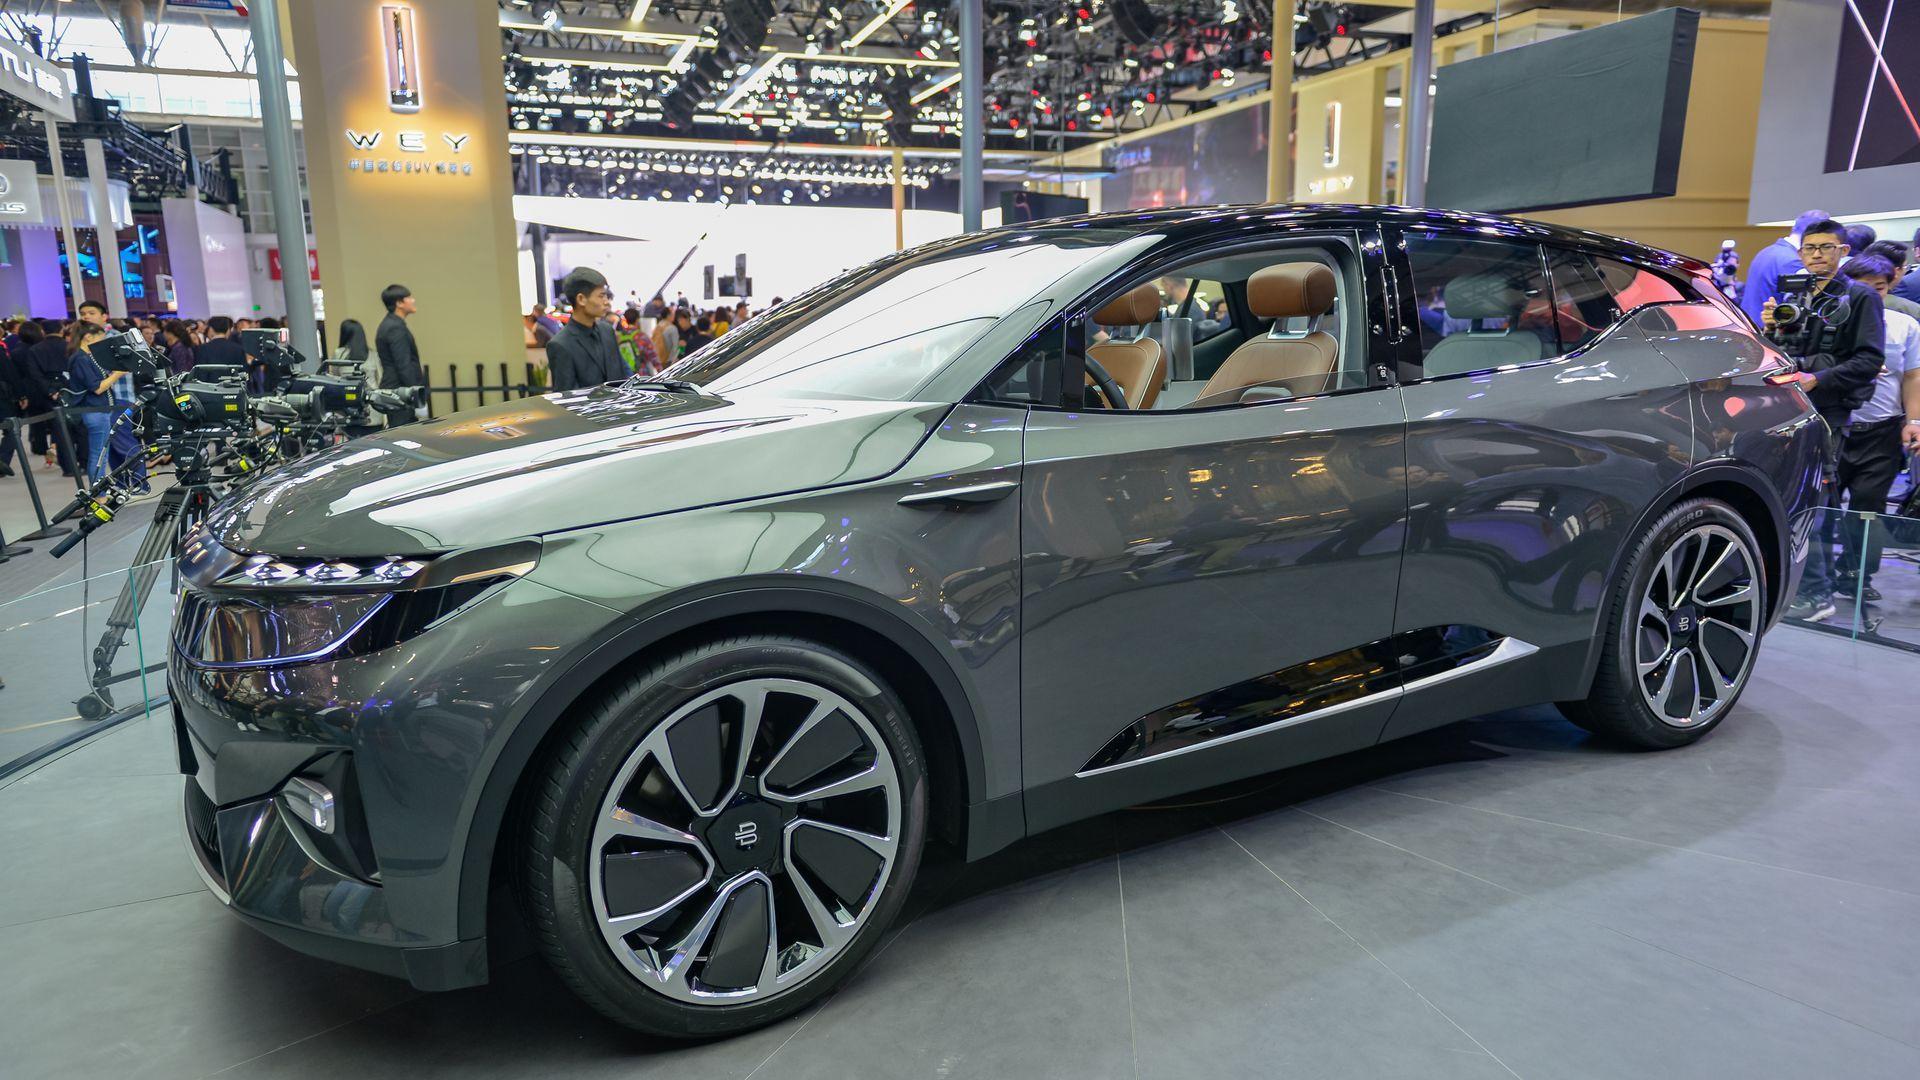 Byton electric vehicle